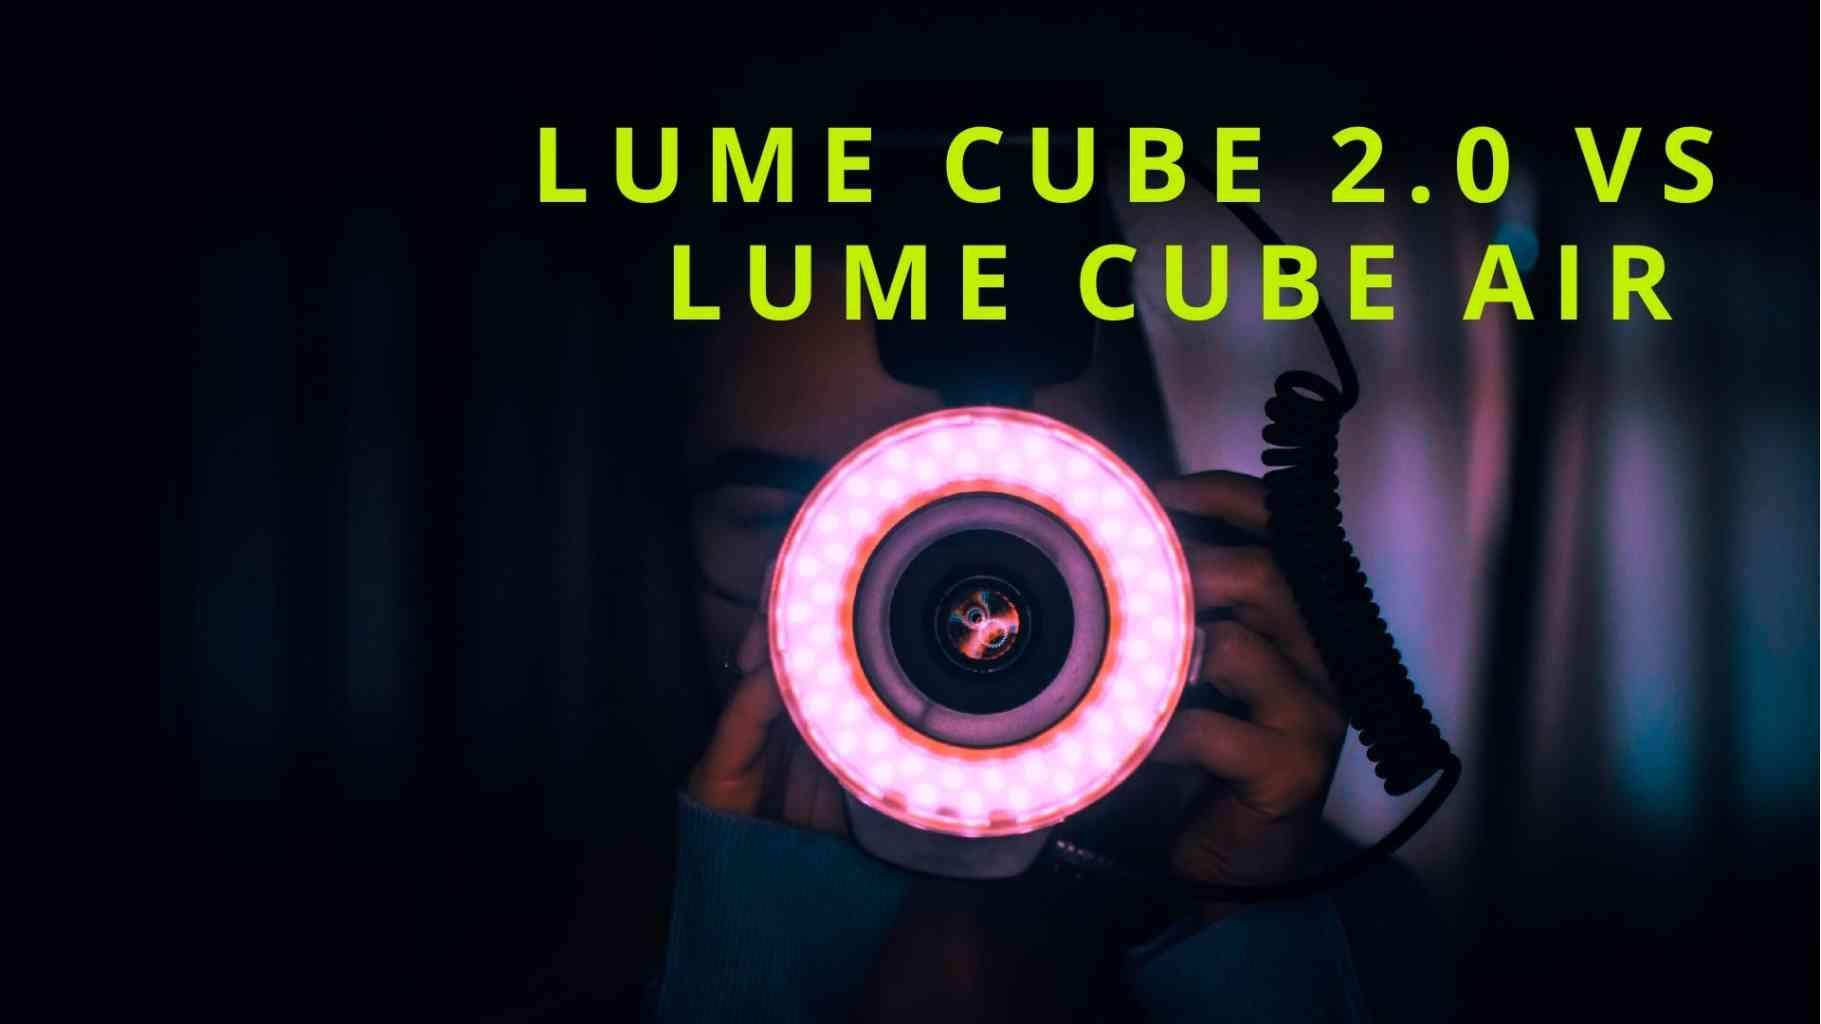 Lume Cube 2.0 vs Lume Cube Air [Comparison]